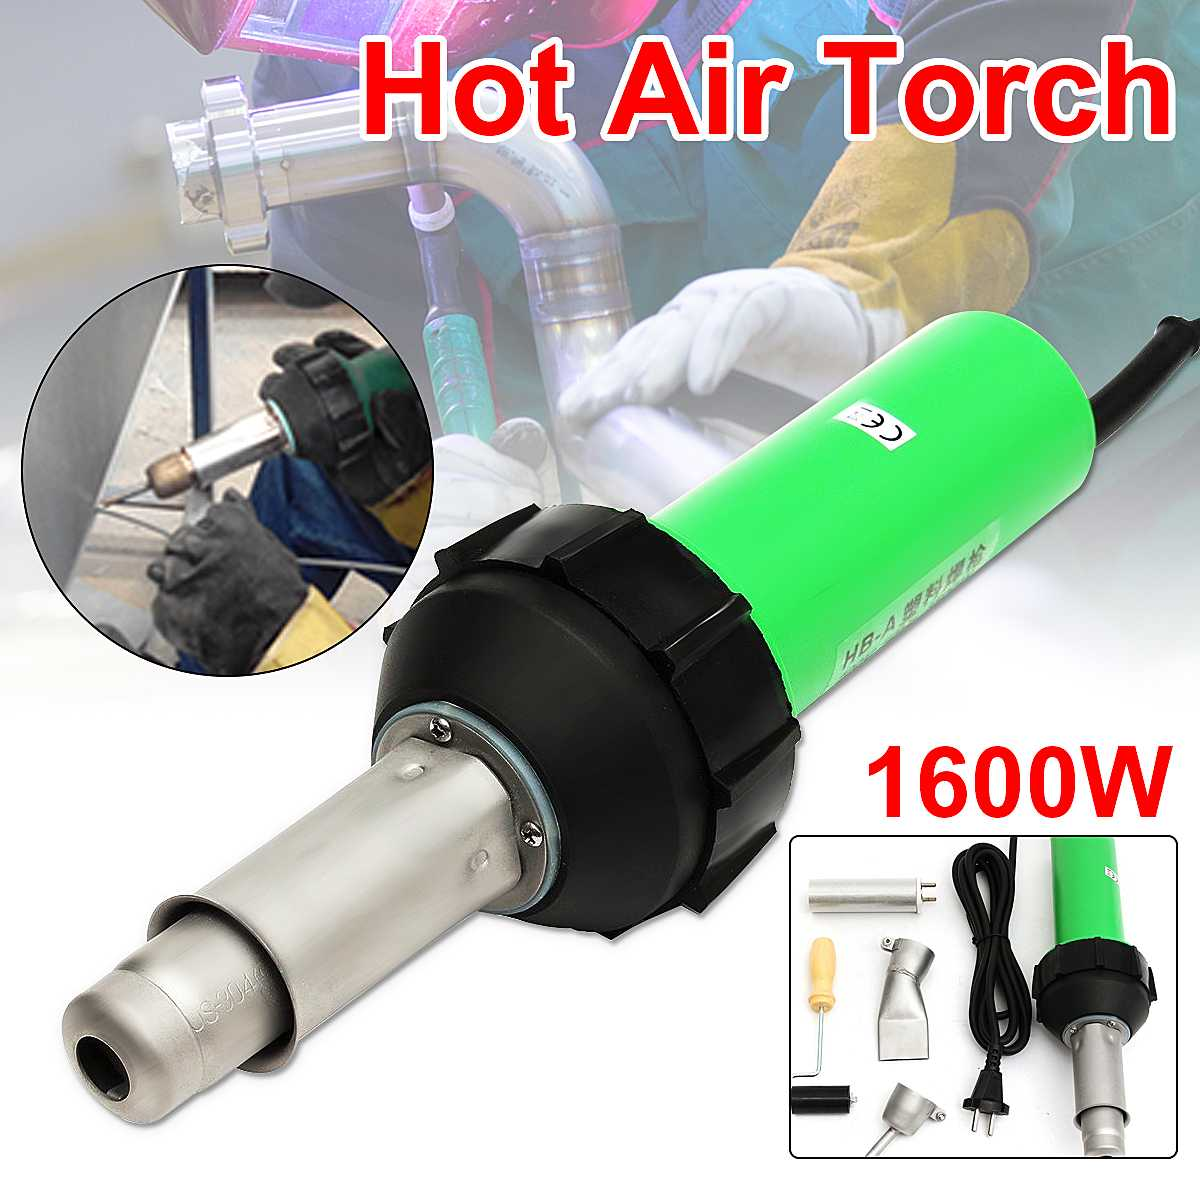 Hot Air Torch Plastic Welding Gun Welder Pistol 1600W 110V//220V+4pcs Nozzle